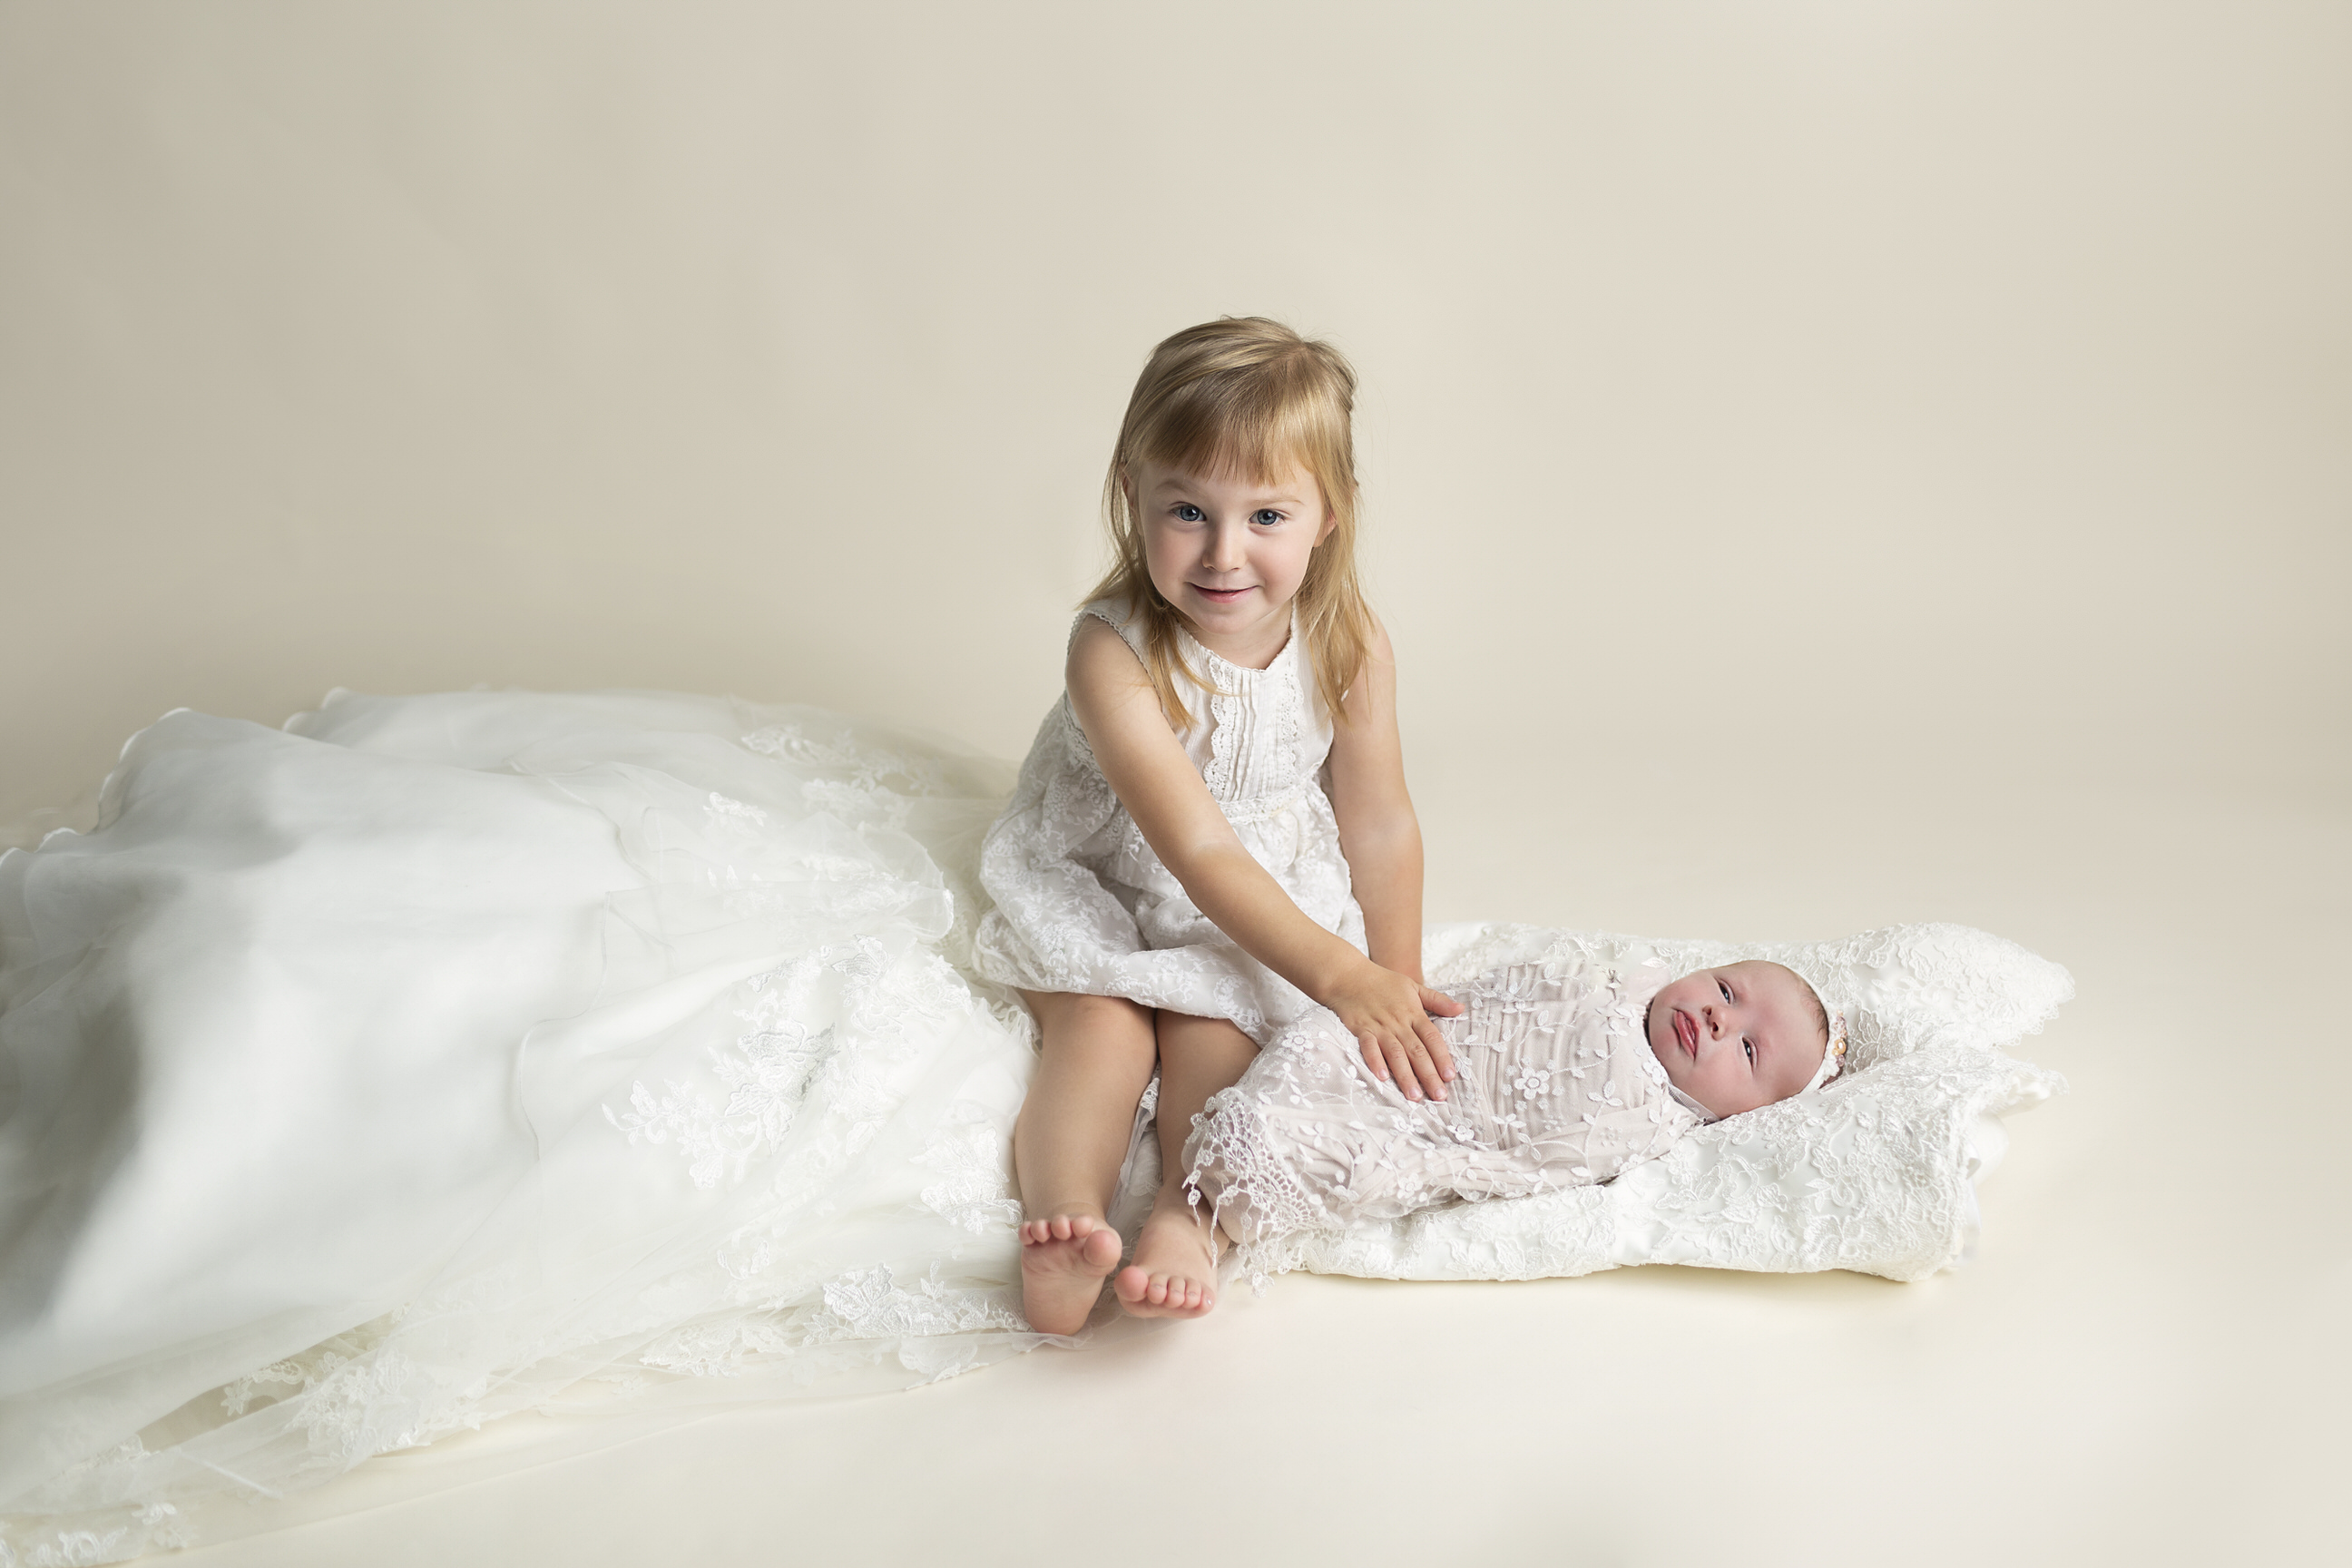 Newborn photos with Wedding Dress Regina